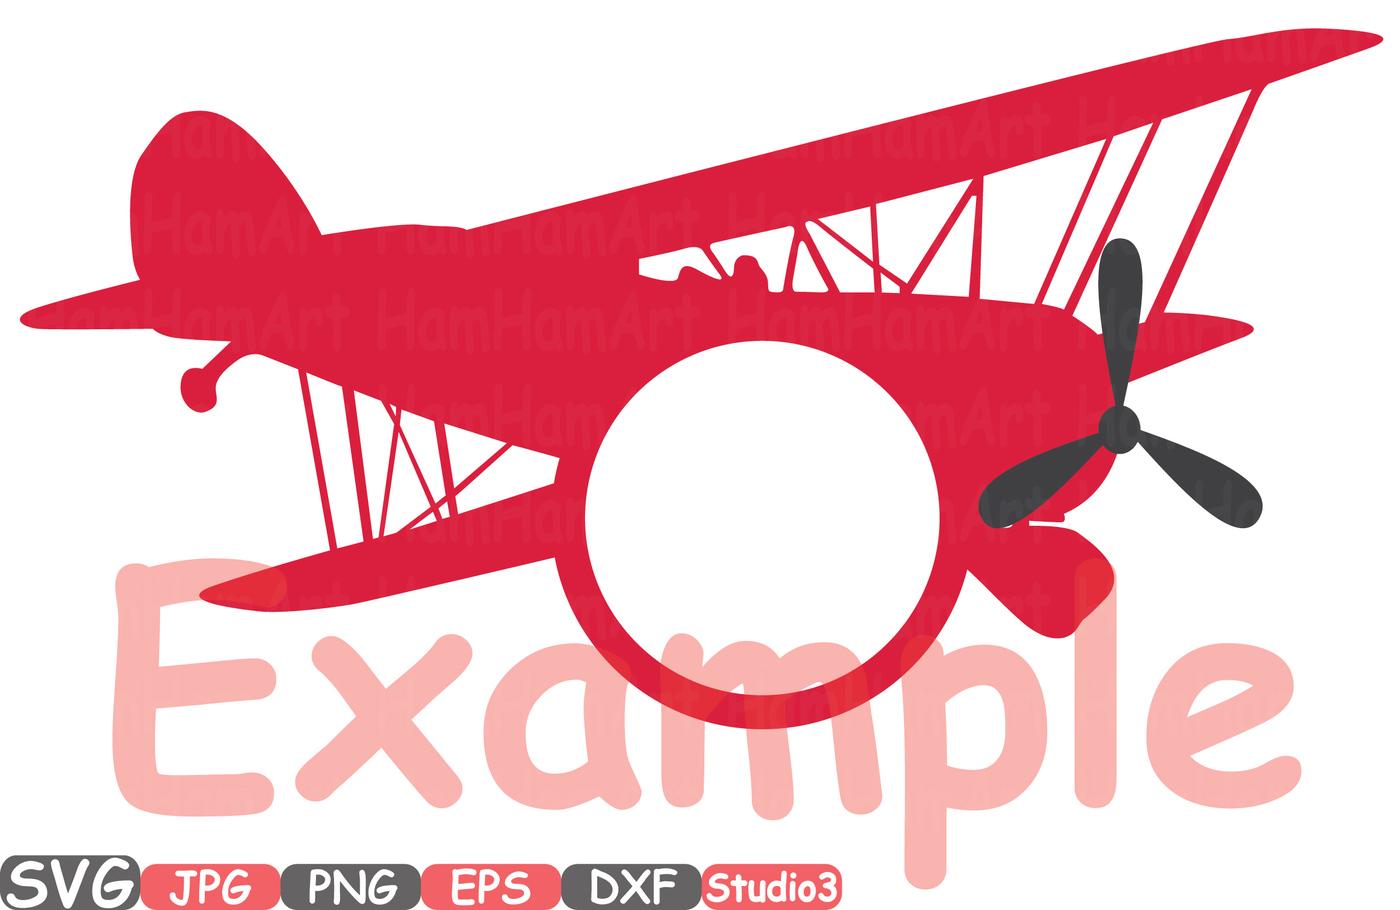 1400x910 Patriotic Planes Silhouette Cutting Files Airplane Monogram